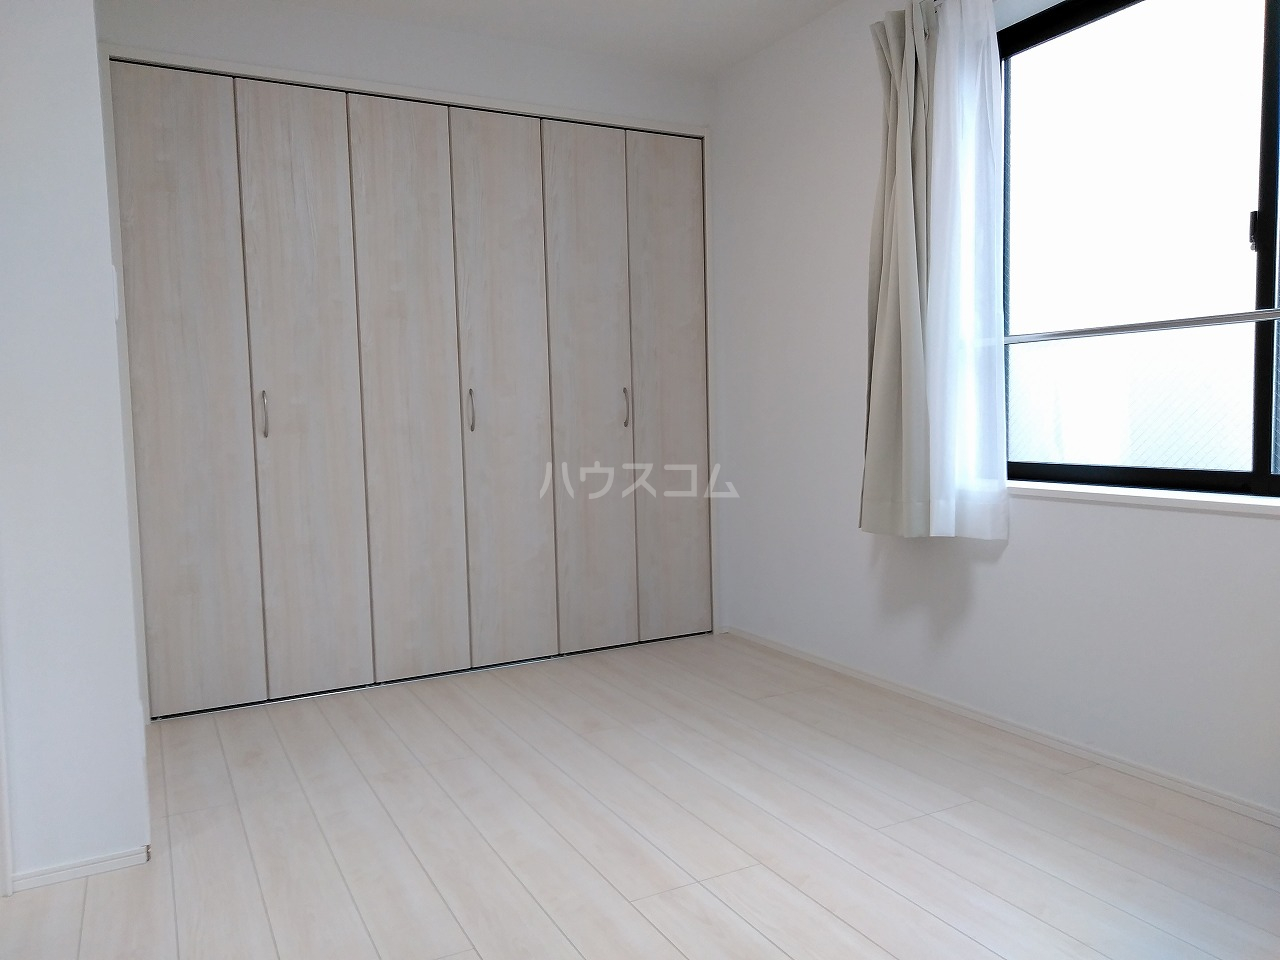 J・スタイリオ堀切 304号室のベッドルーム